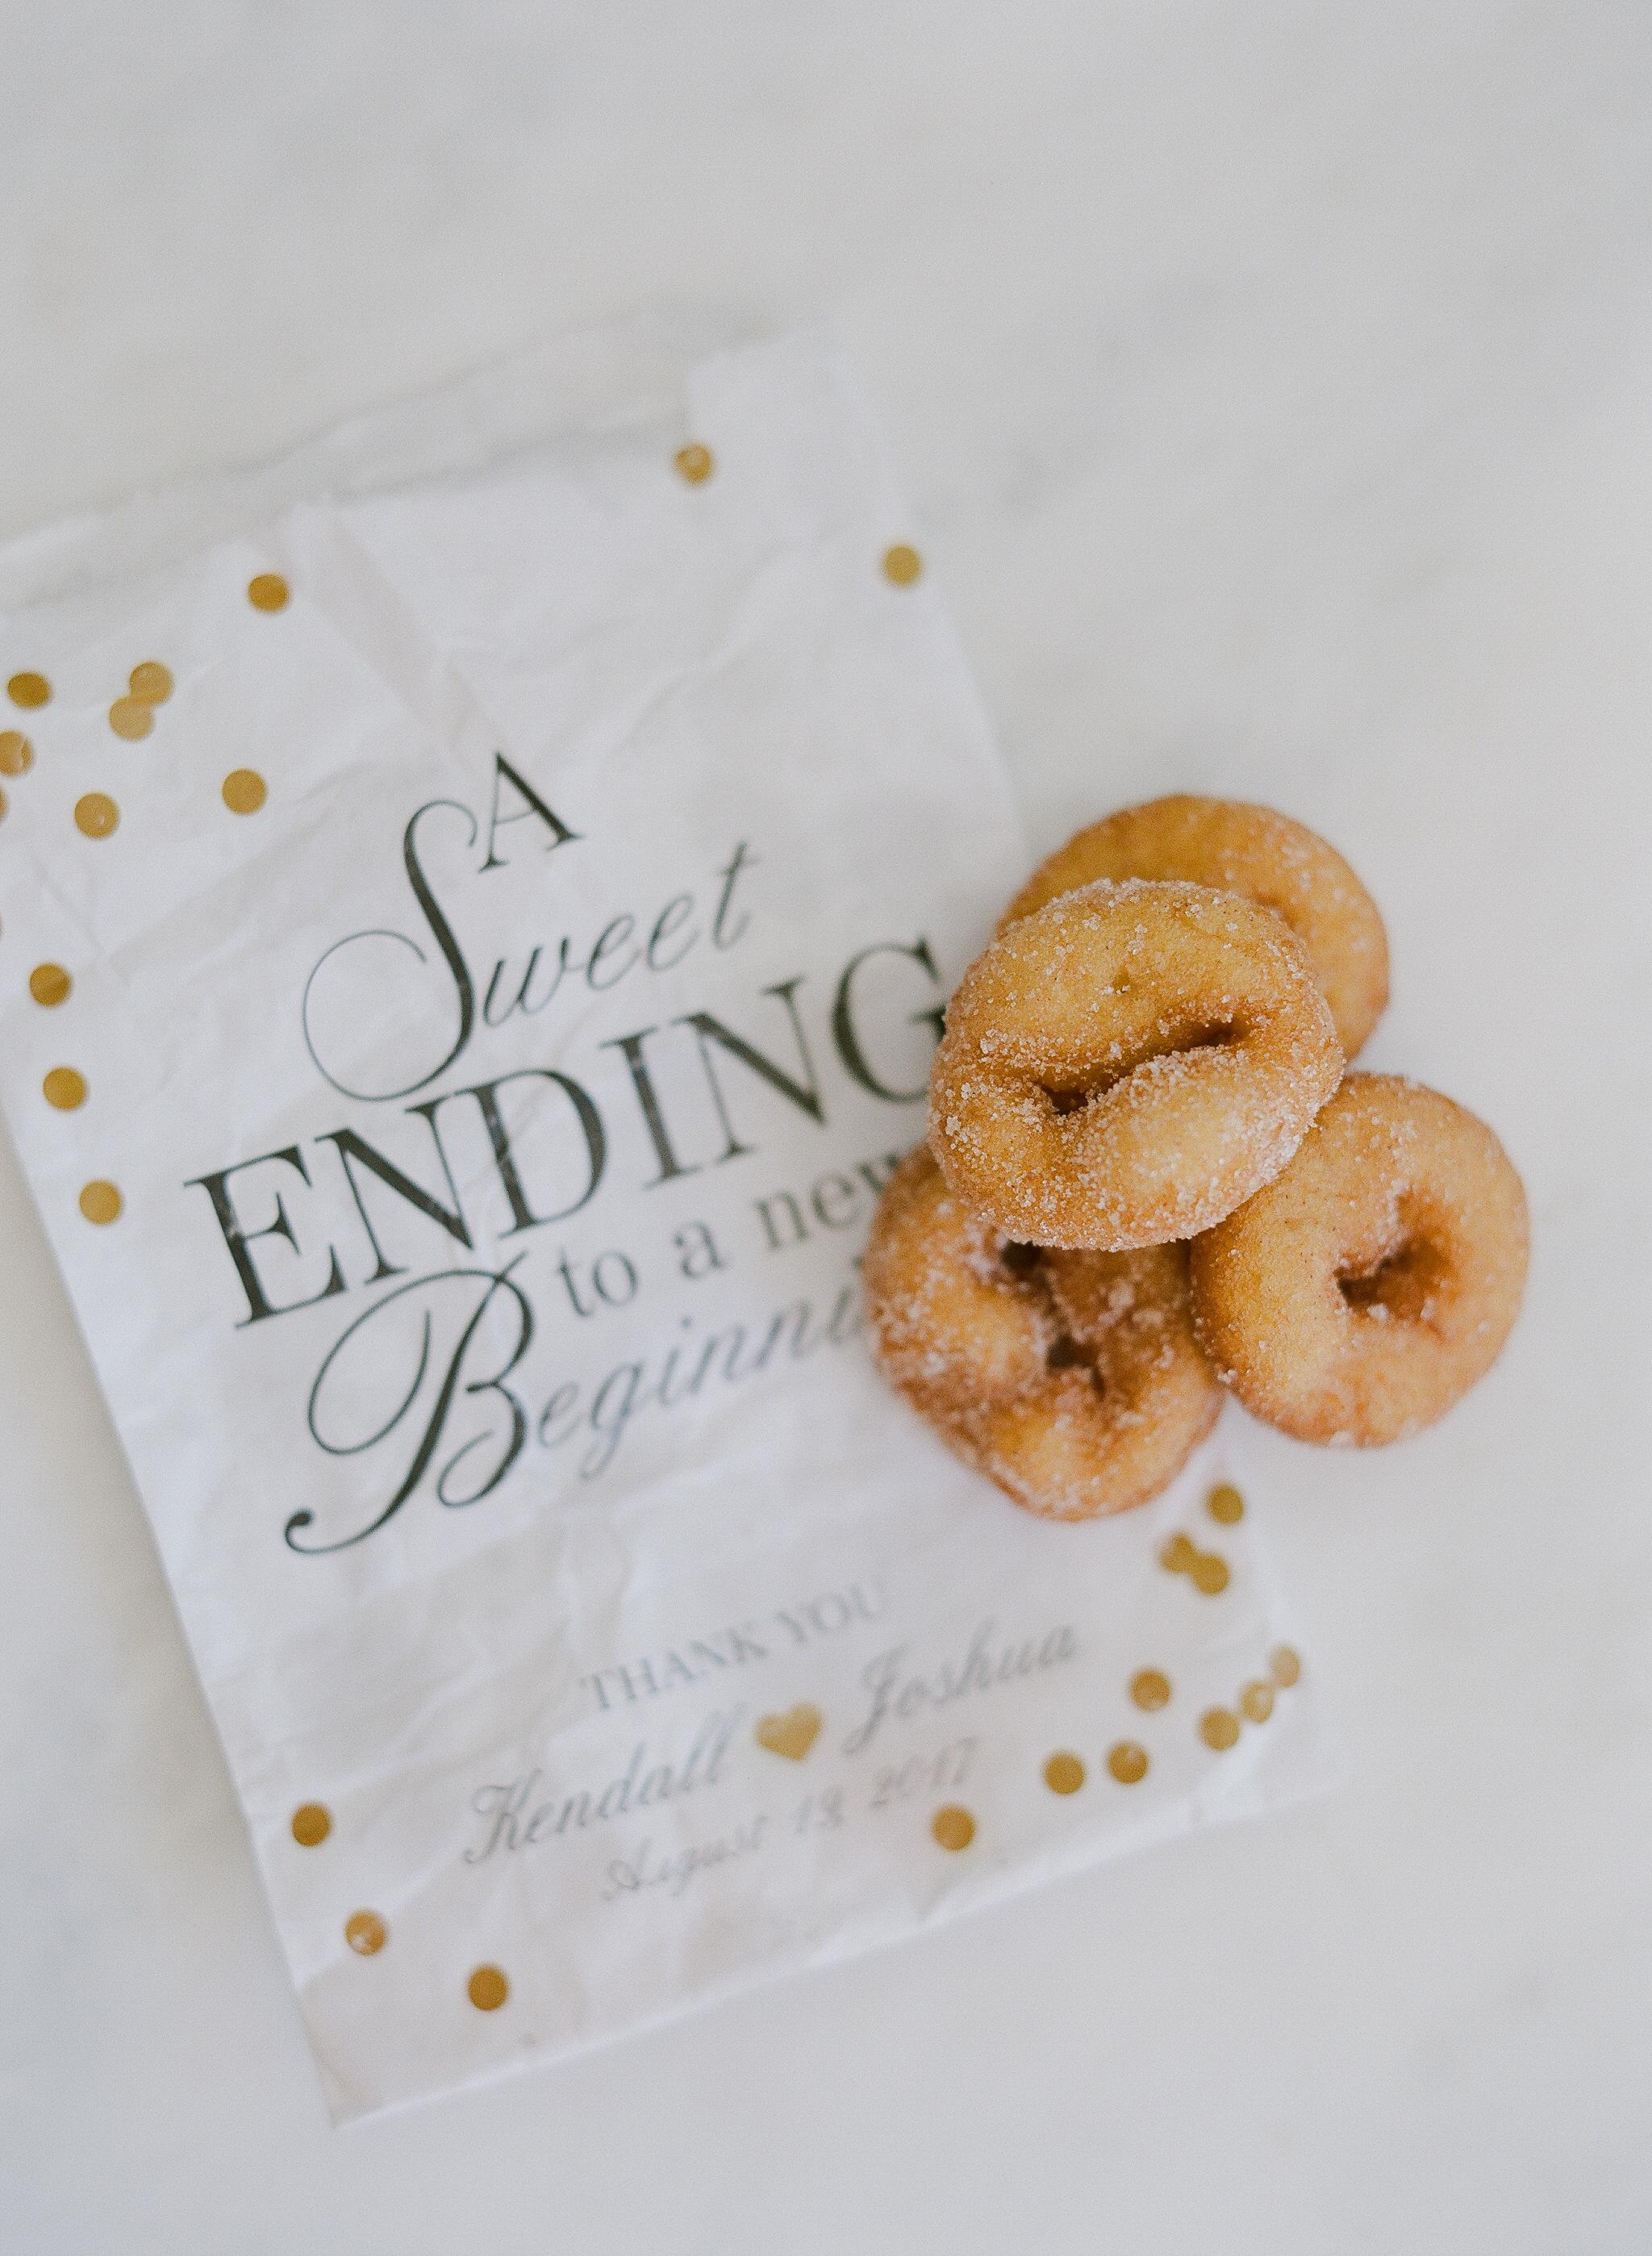 Kendall Sweeny Puncochar Wedding 08.19.17 - Simply Splendid Photography.jpg